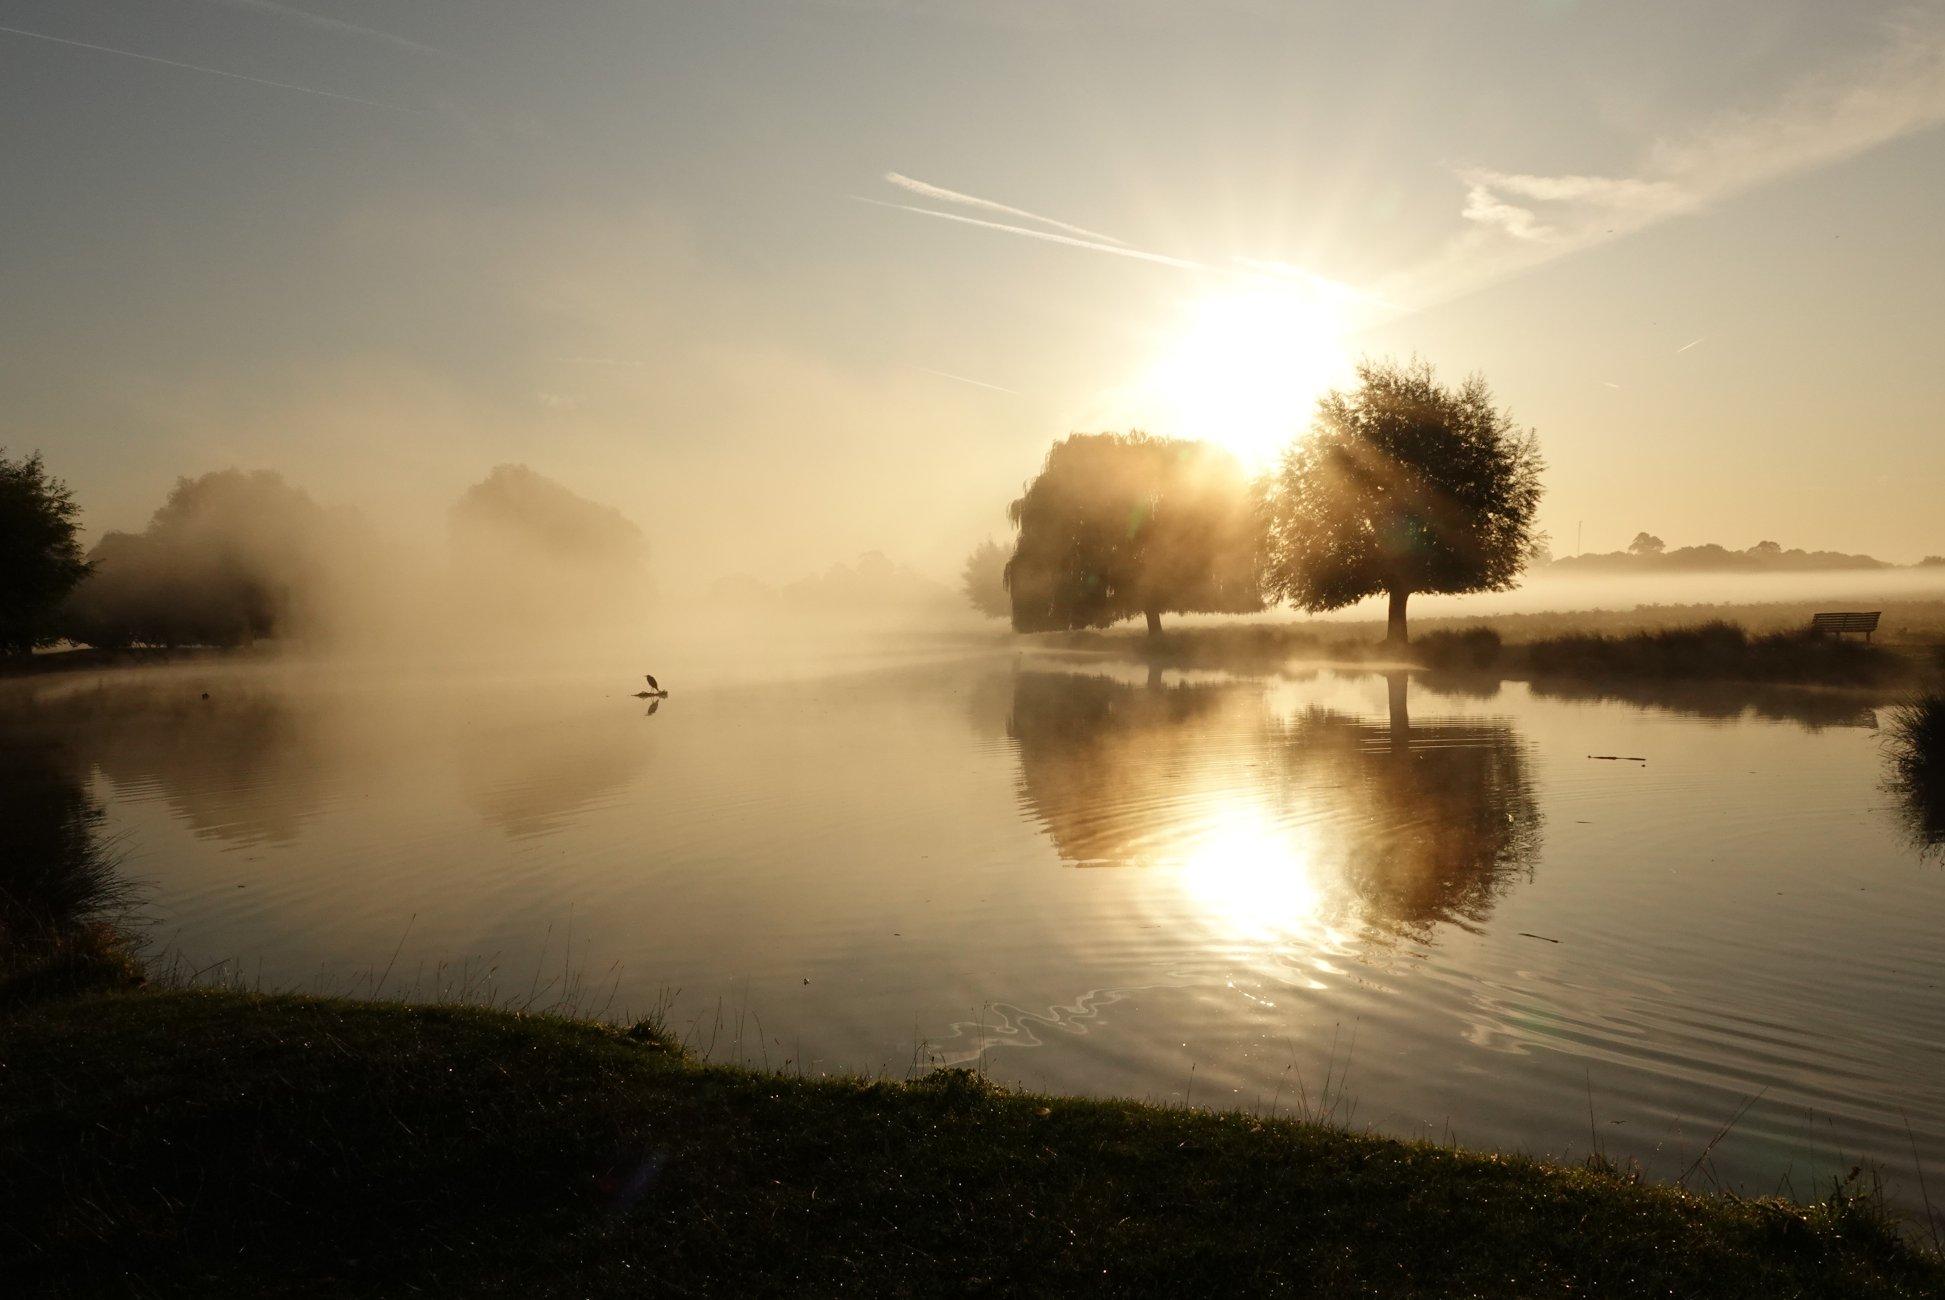 all alone on a misty day